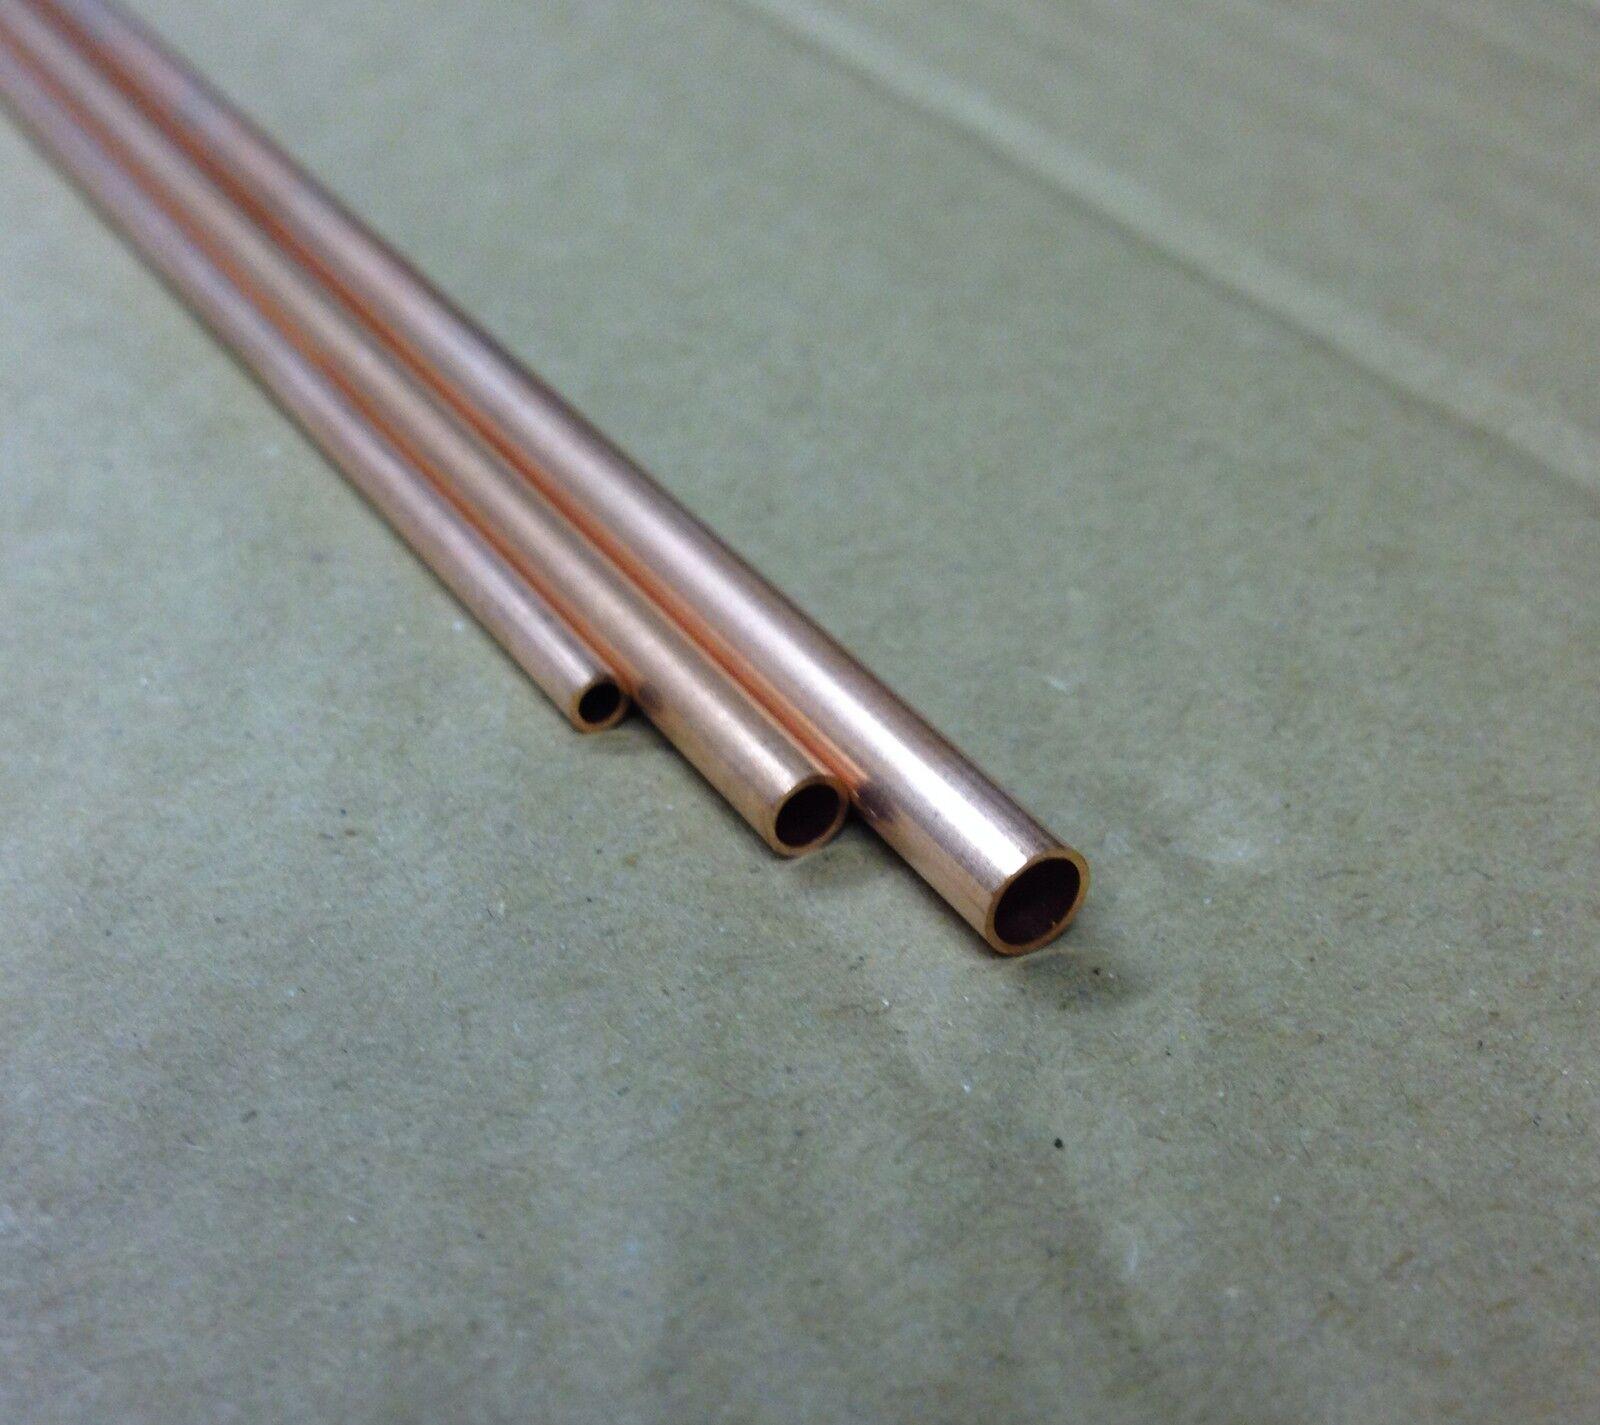 Copper Tube 2mm, 3mm, 4mm, 5mm,6mm, 300mm long 0.45mm wall. Model making